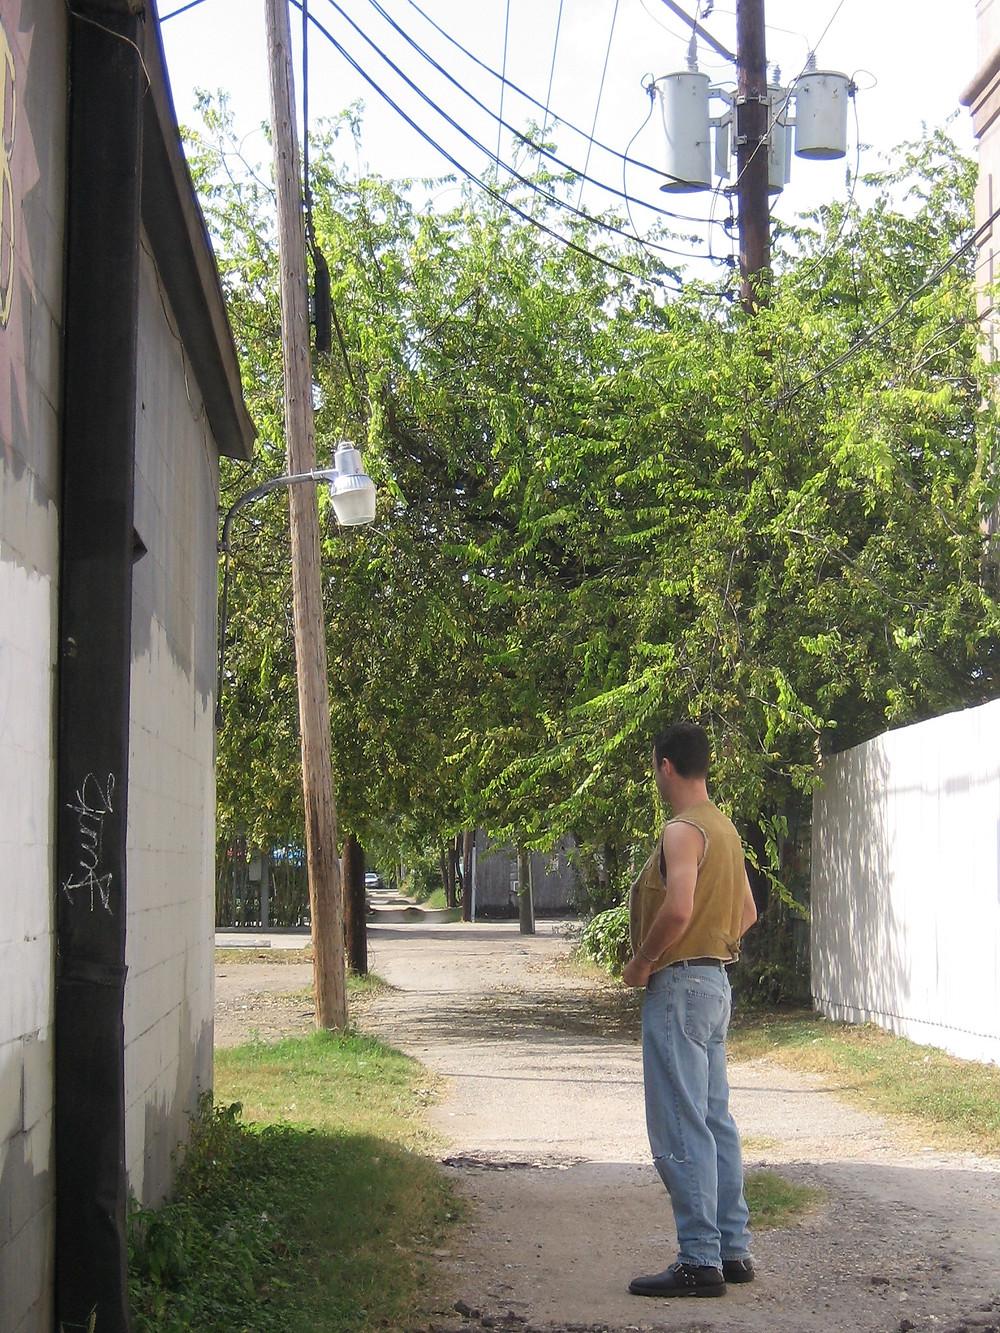 Alley Three